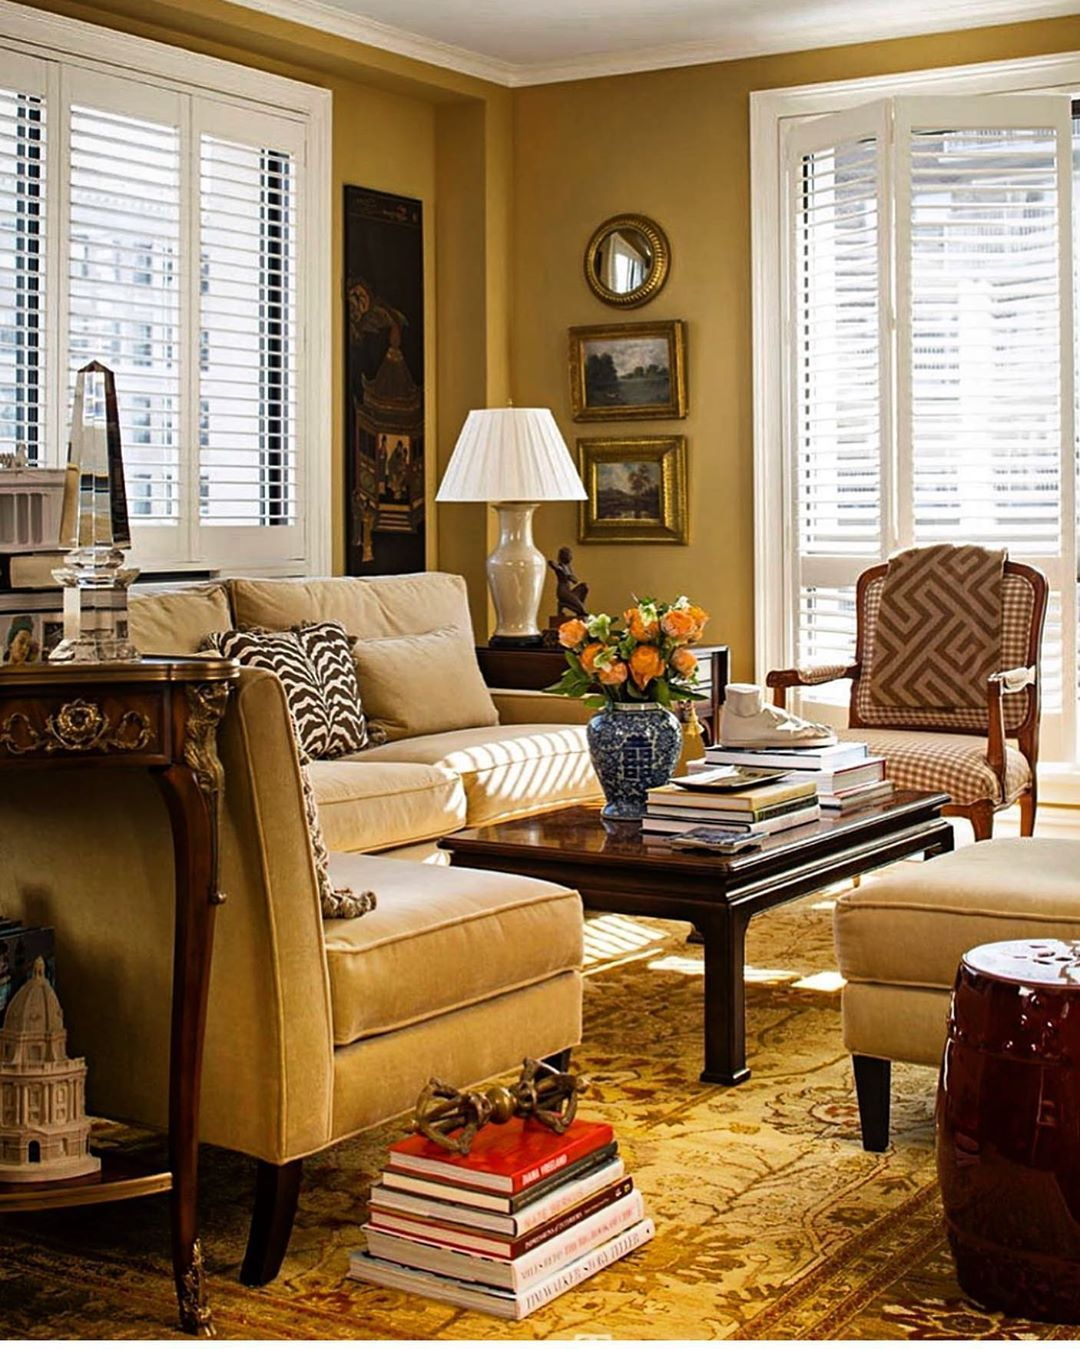 Living Room Traditionalhome Via Schefferinteriors 🧡 ️